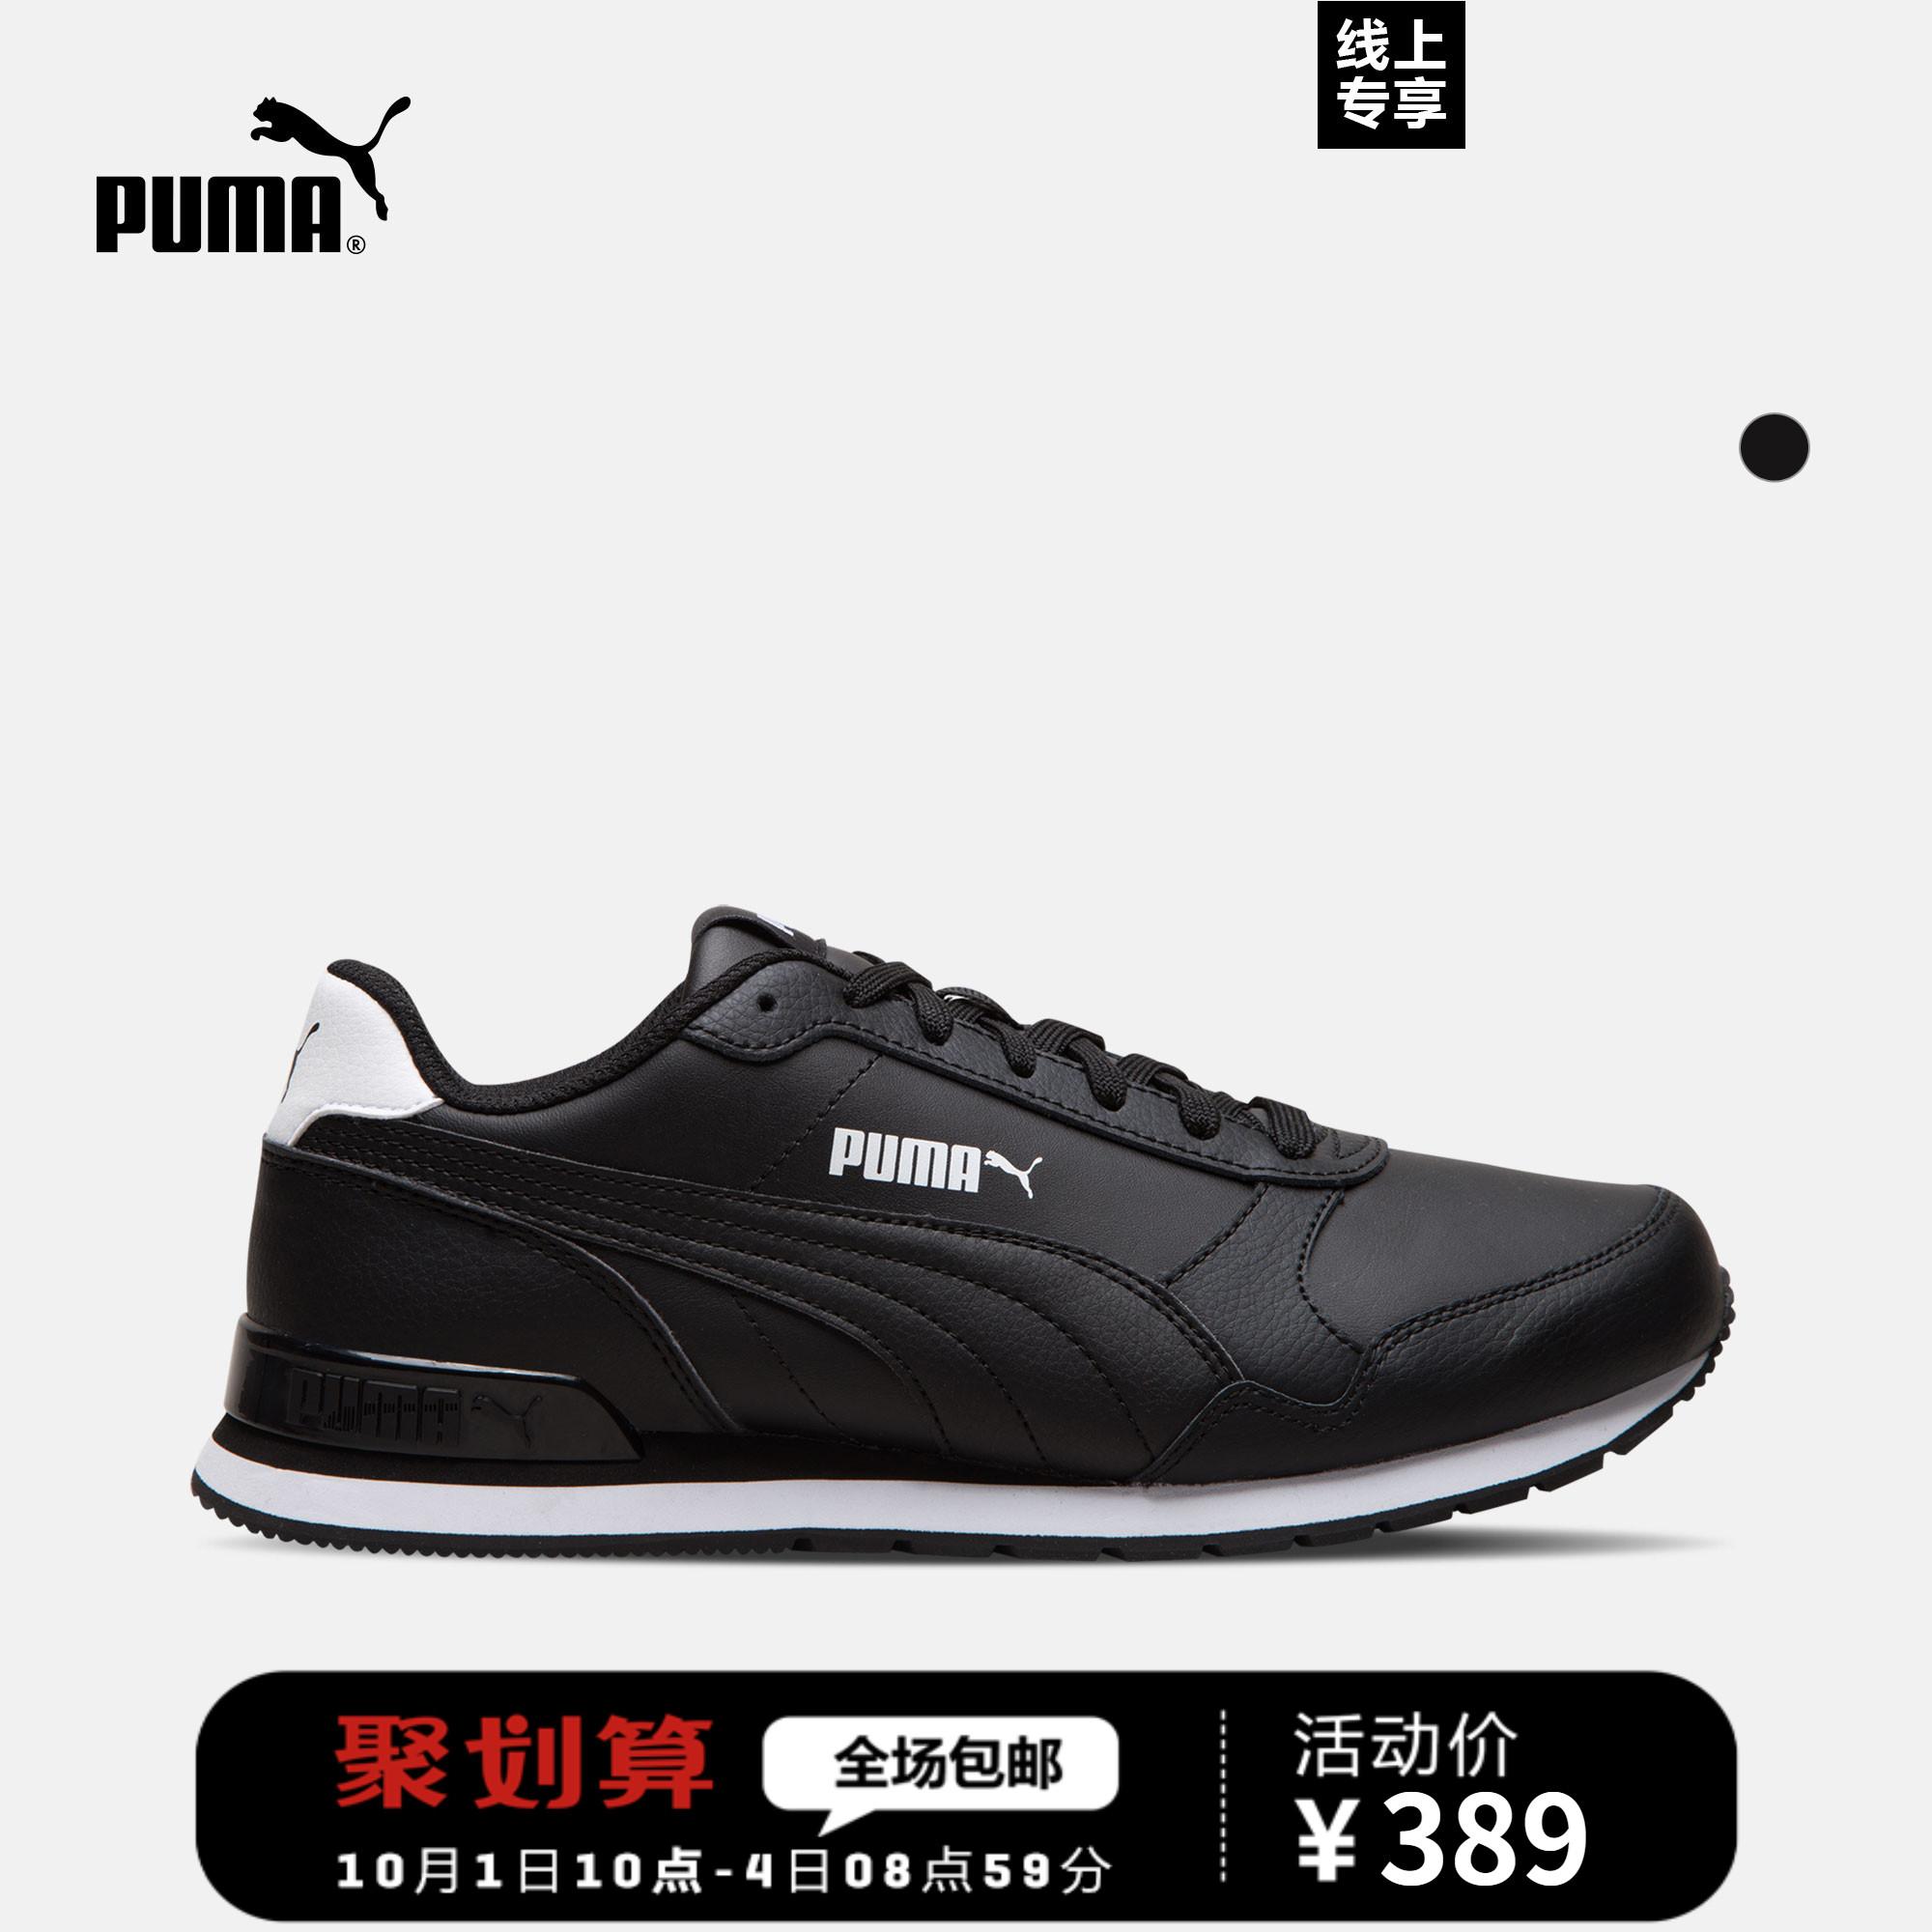 PUMA彪马官方 男女同款休闲鞋 ST Runner V2 Full 365277